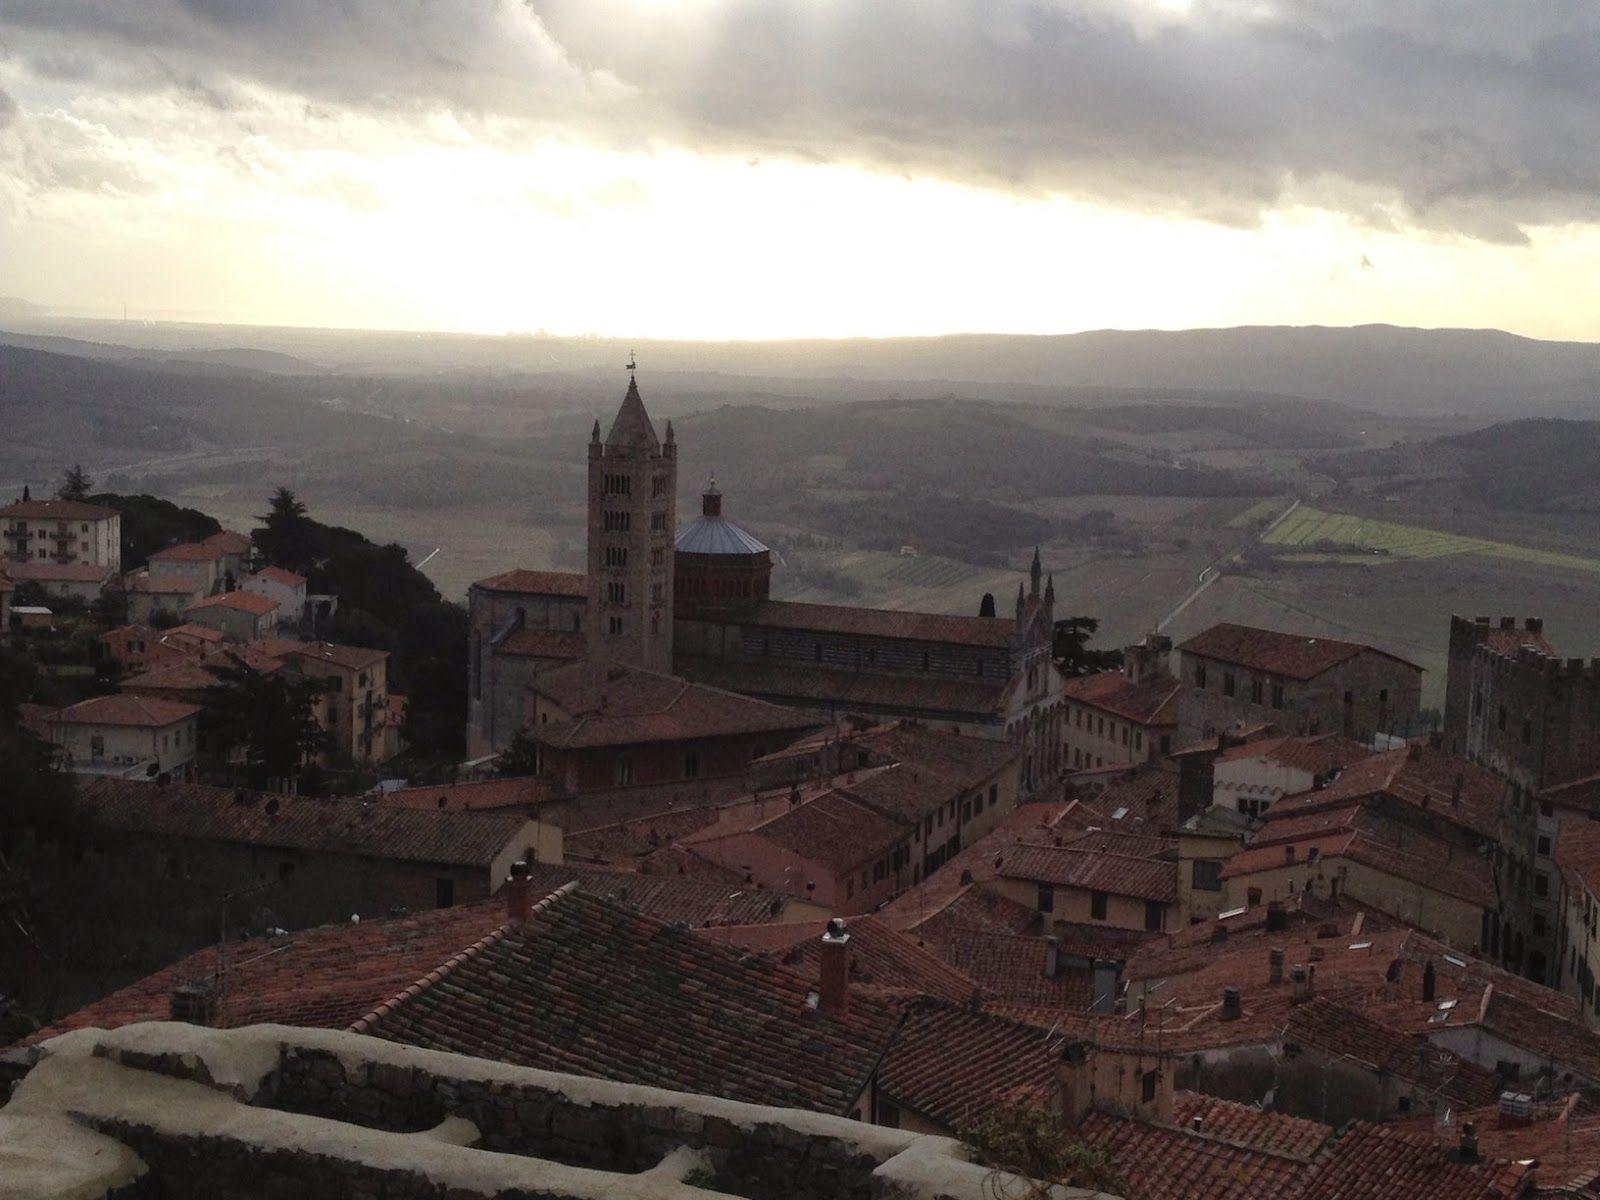 Massa Marittima - Toscana - Italy - http://viaterra.blogspot.it/